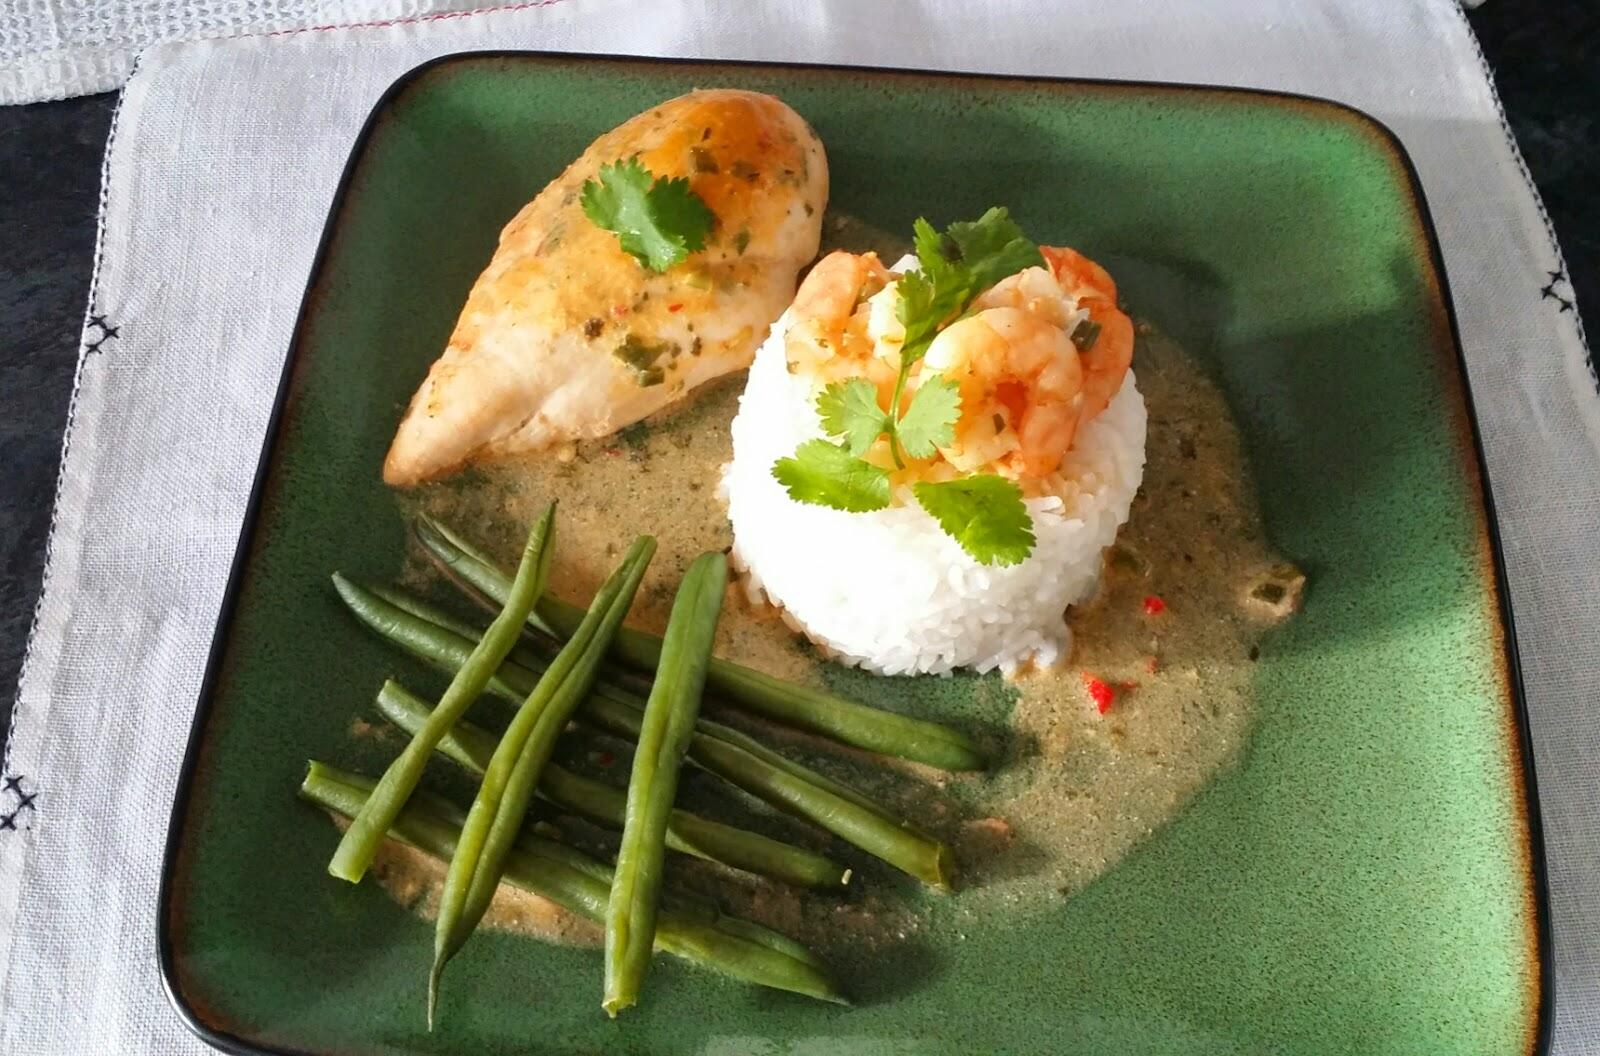 Thai spice coconut chicken and king prawn